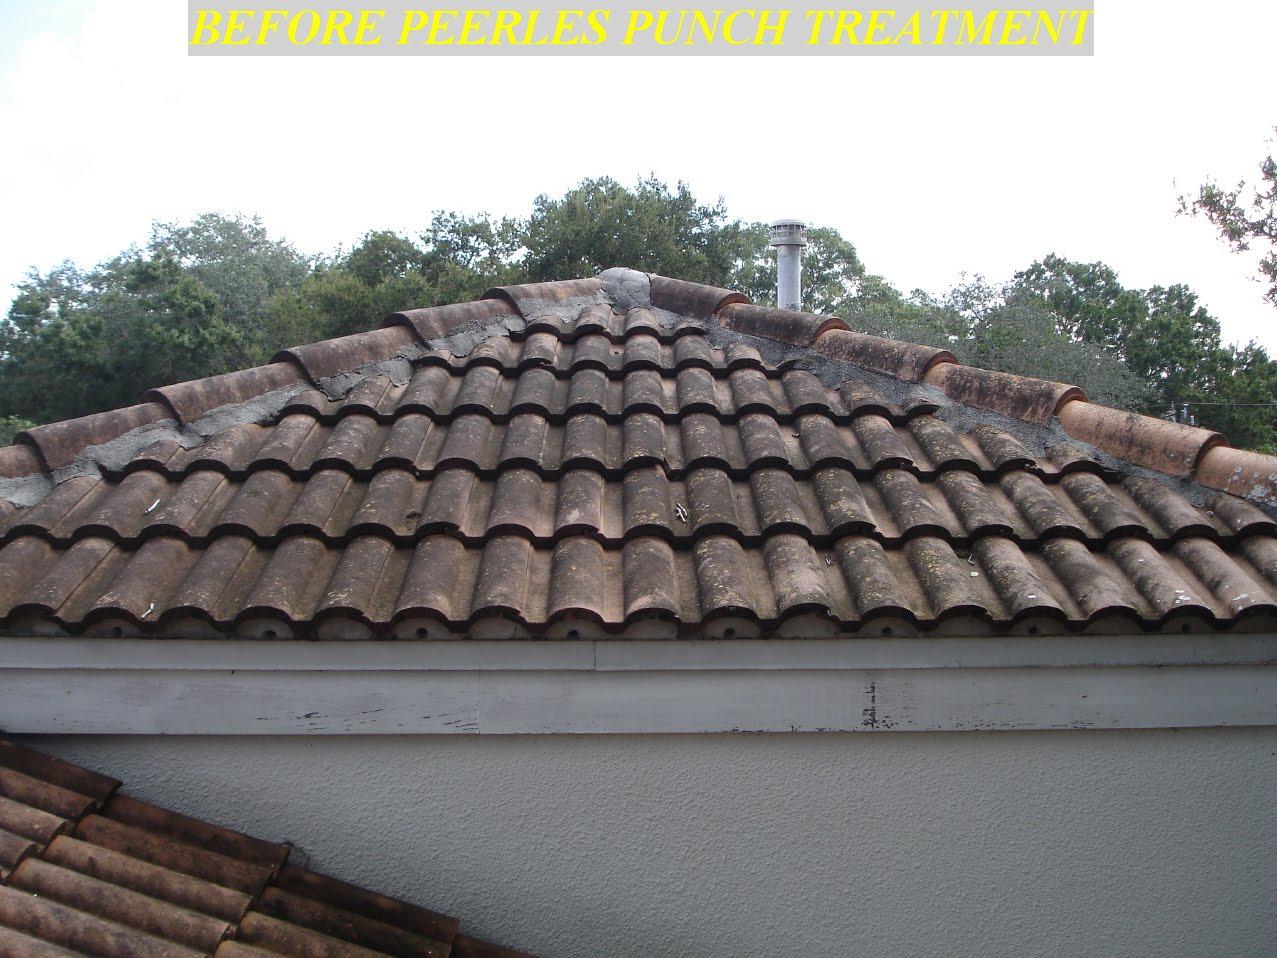 Tile Roof Tile Roof Loading